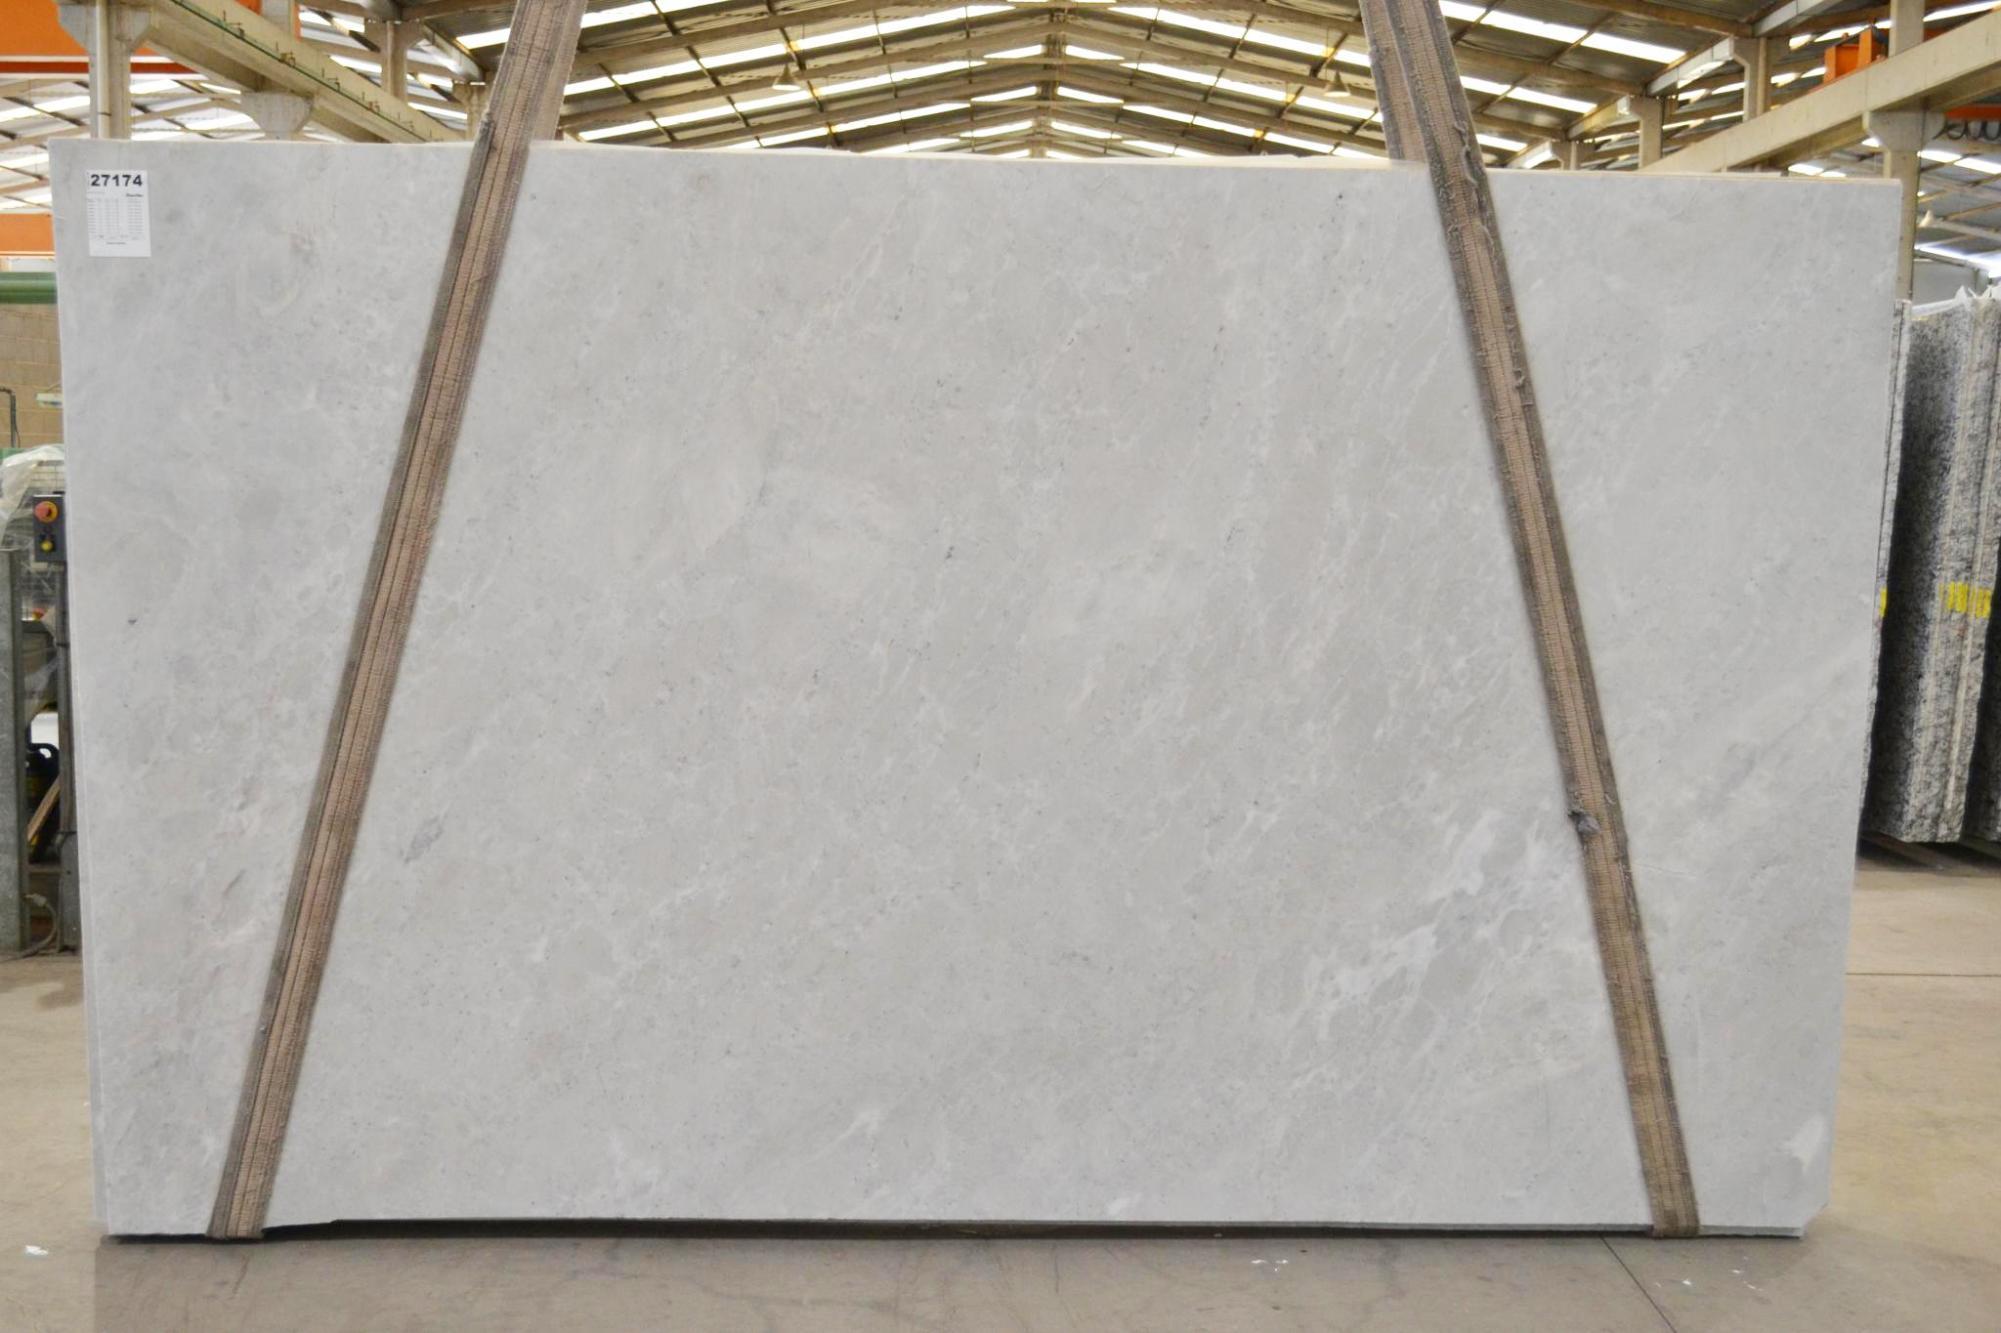 Brazilian Dolomite Supply Espirito Santo (Brazil) polished slabs 2465 , Bnd #27174 natural Dolomite